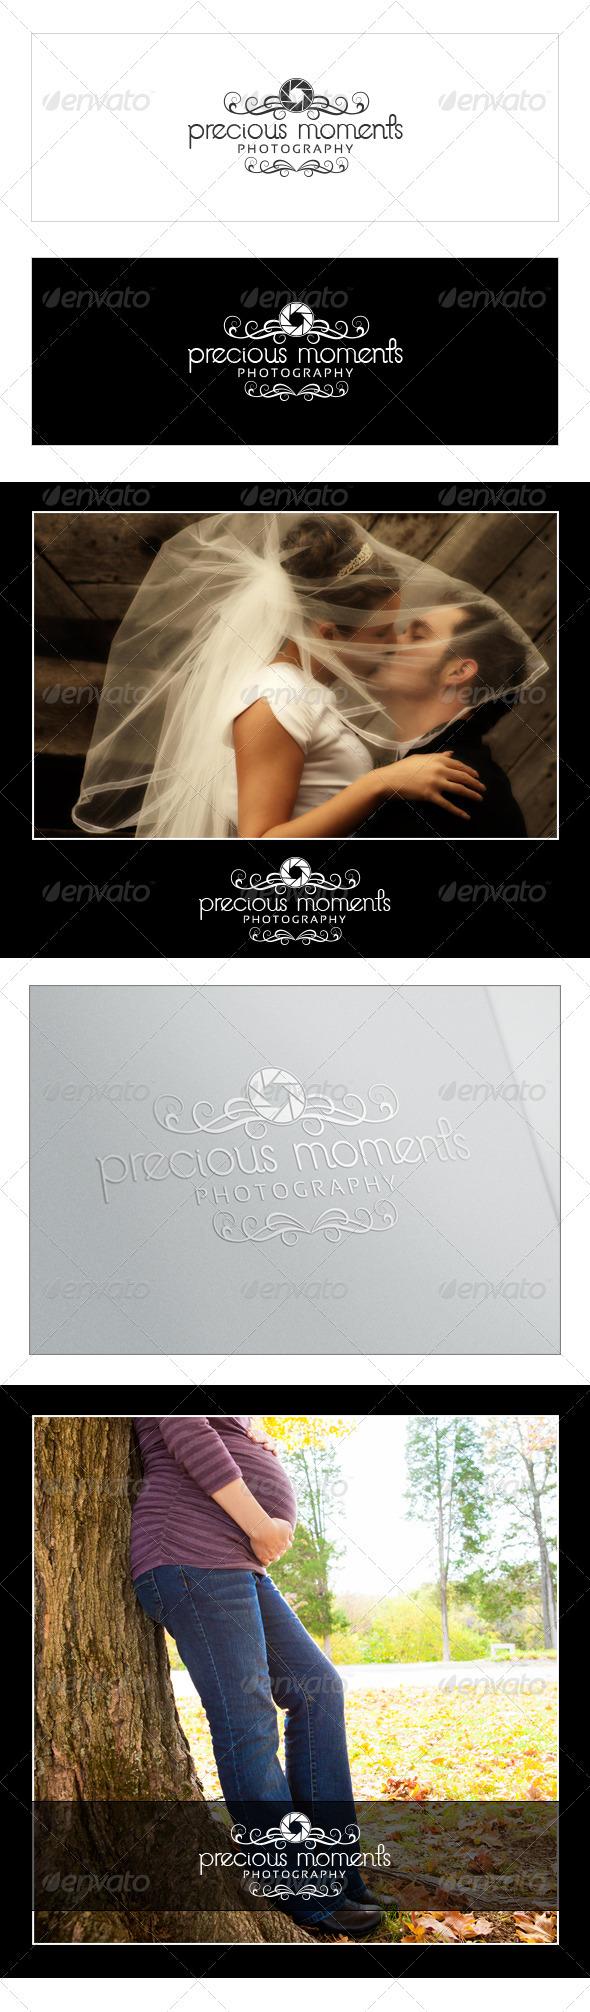 GraphicRiver Precious Moments Photography Logo 3672015